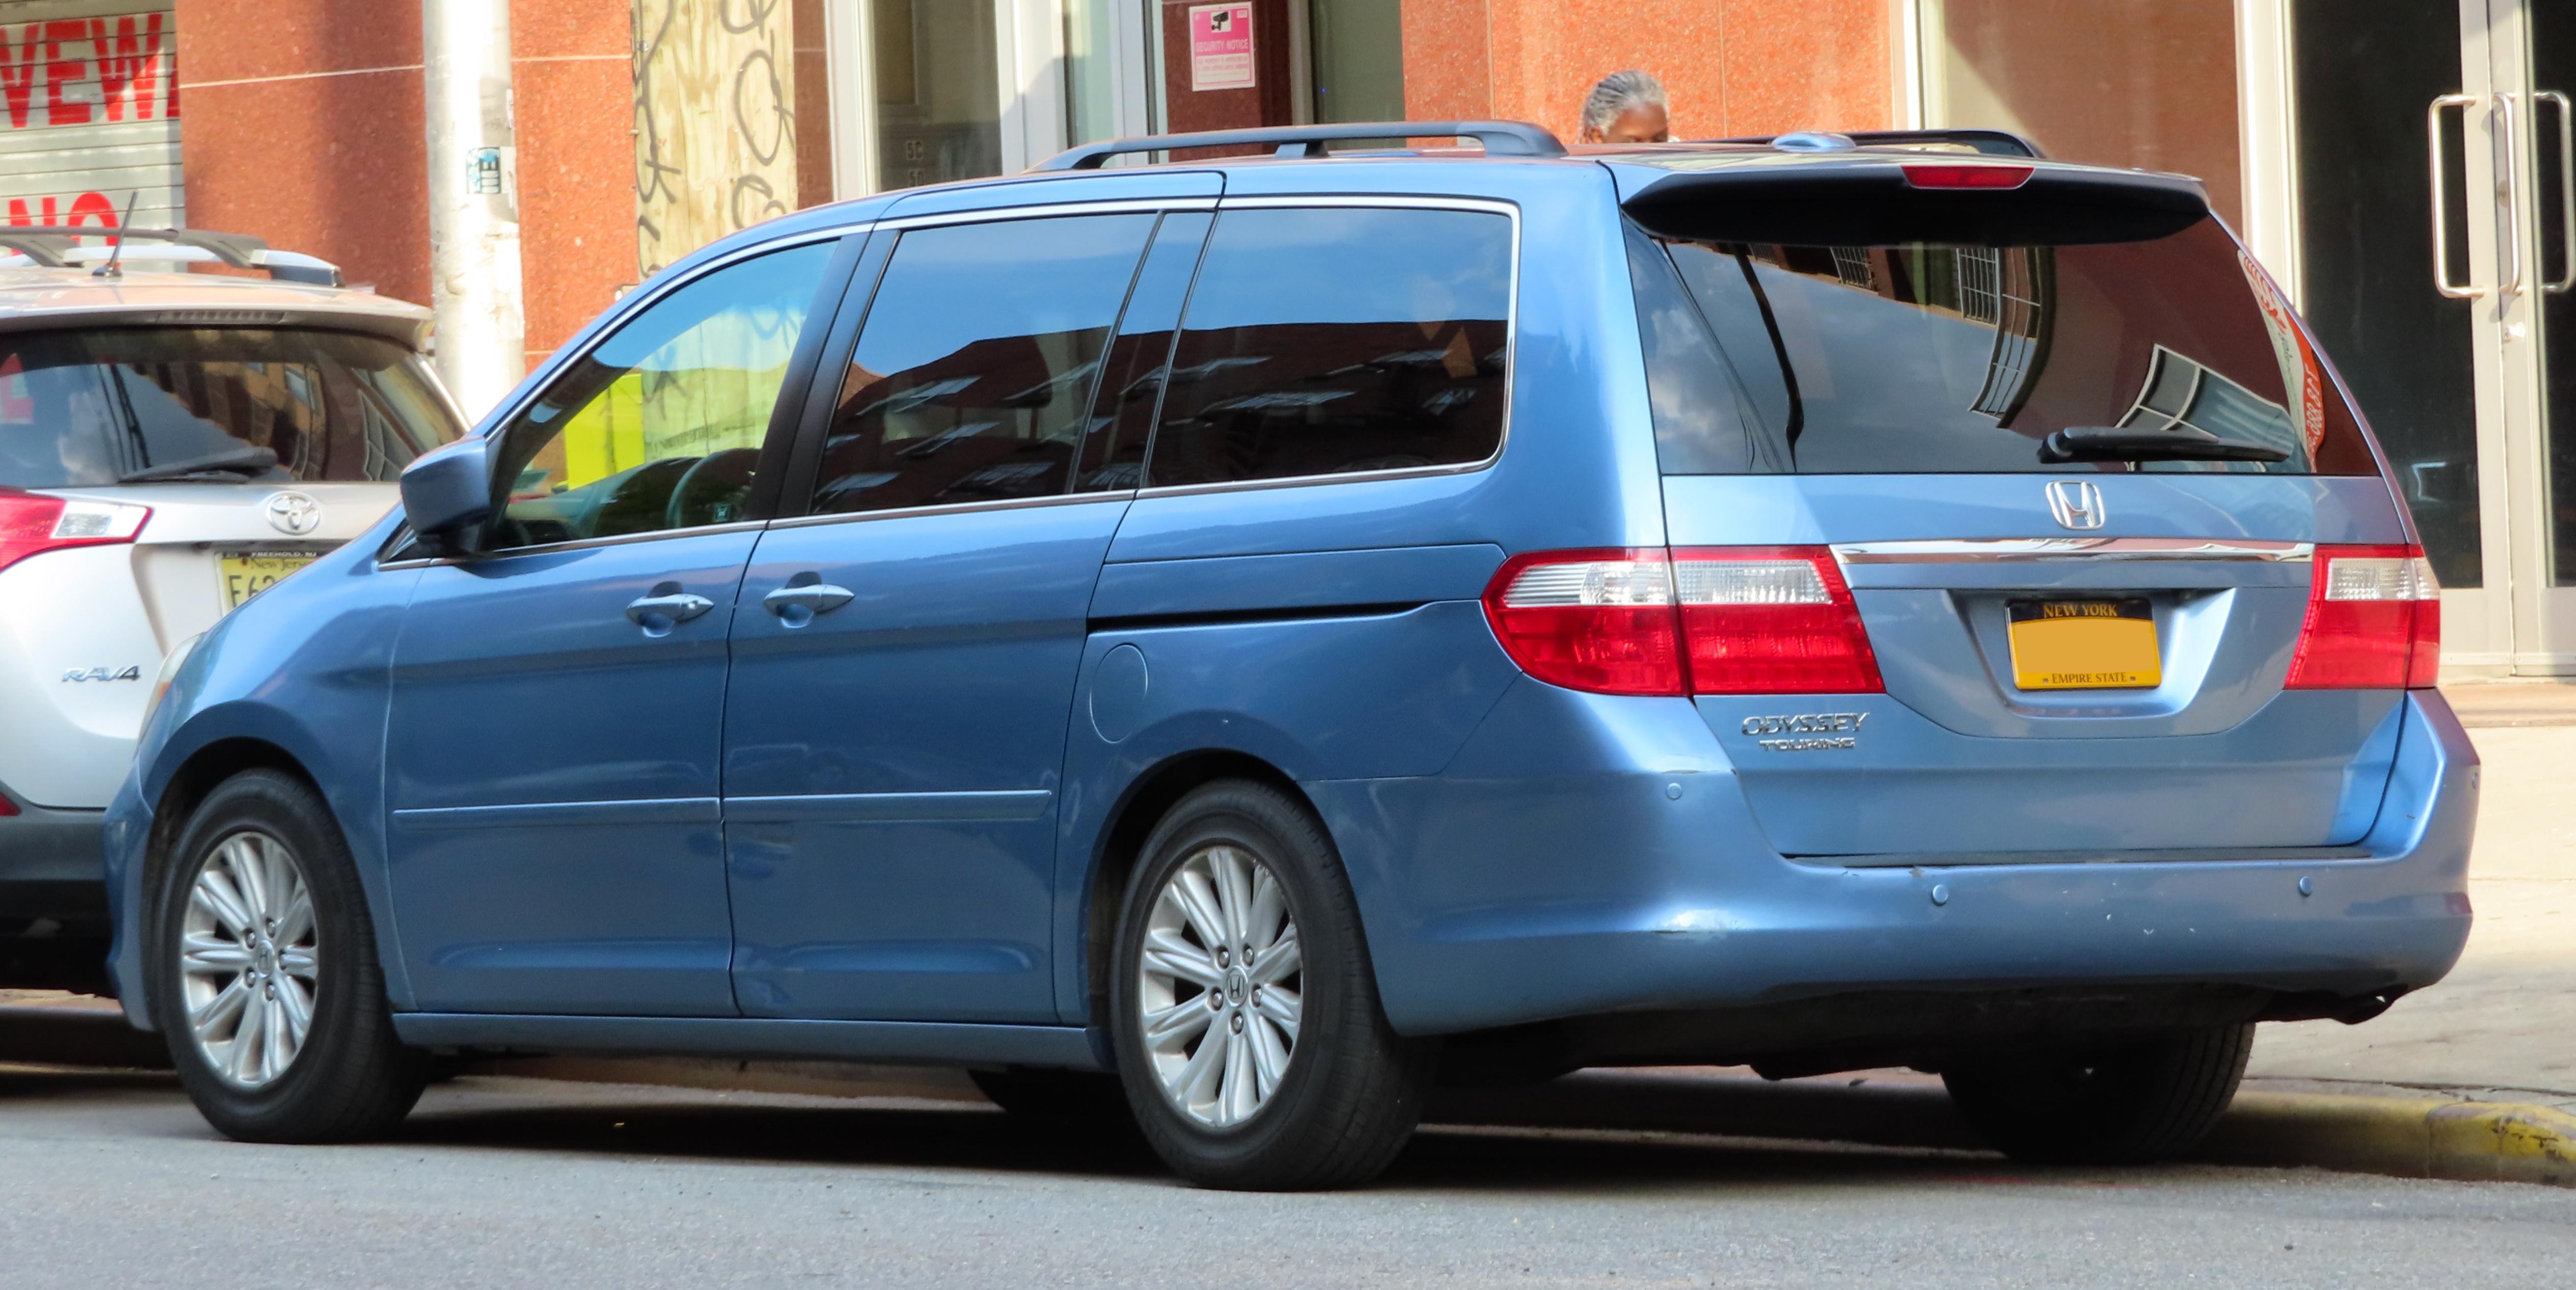 Plik:2006 Honda Odyssey Touring 3.5L, rear 5.31.19.jpg ...